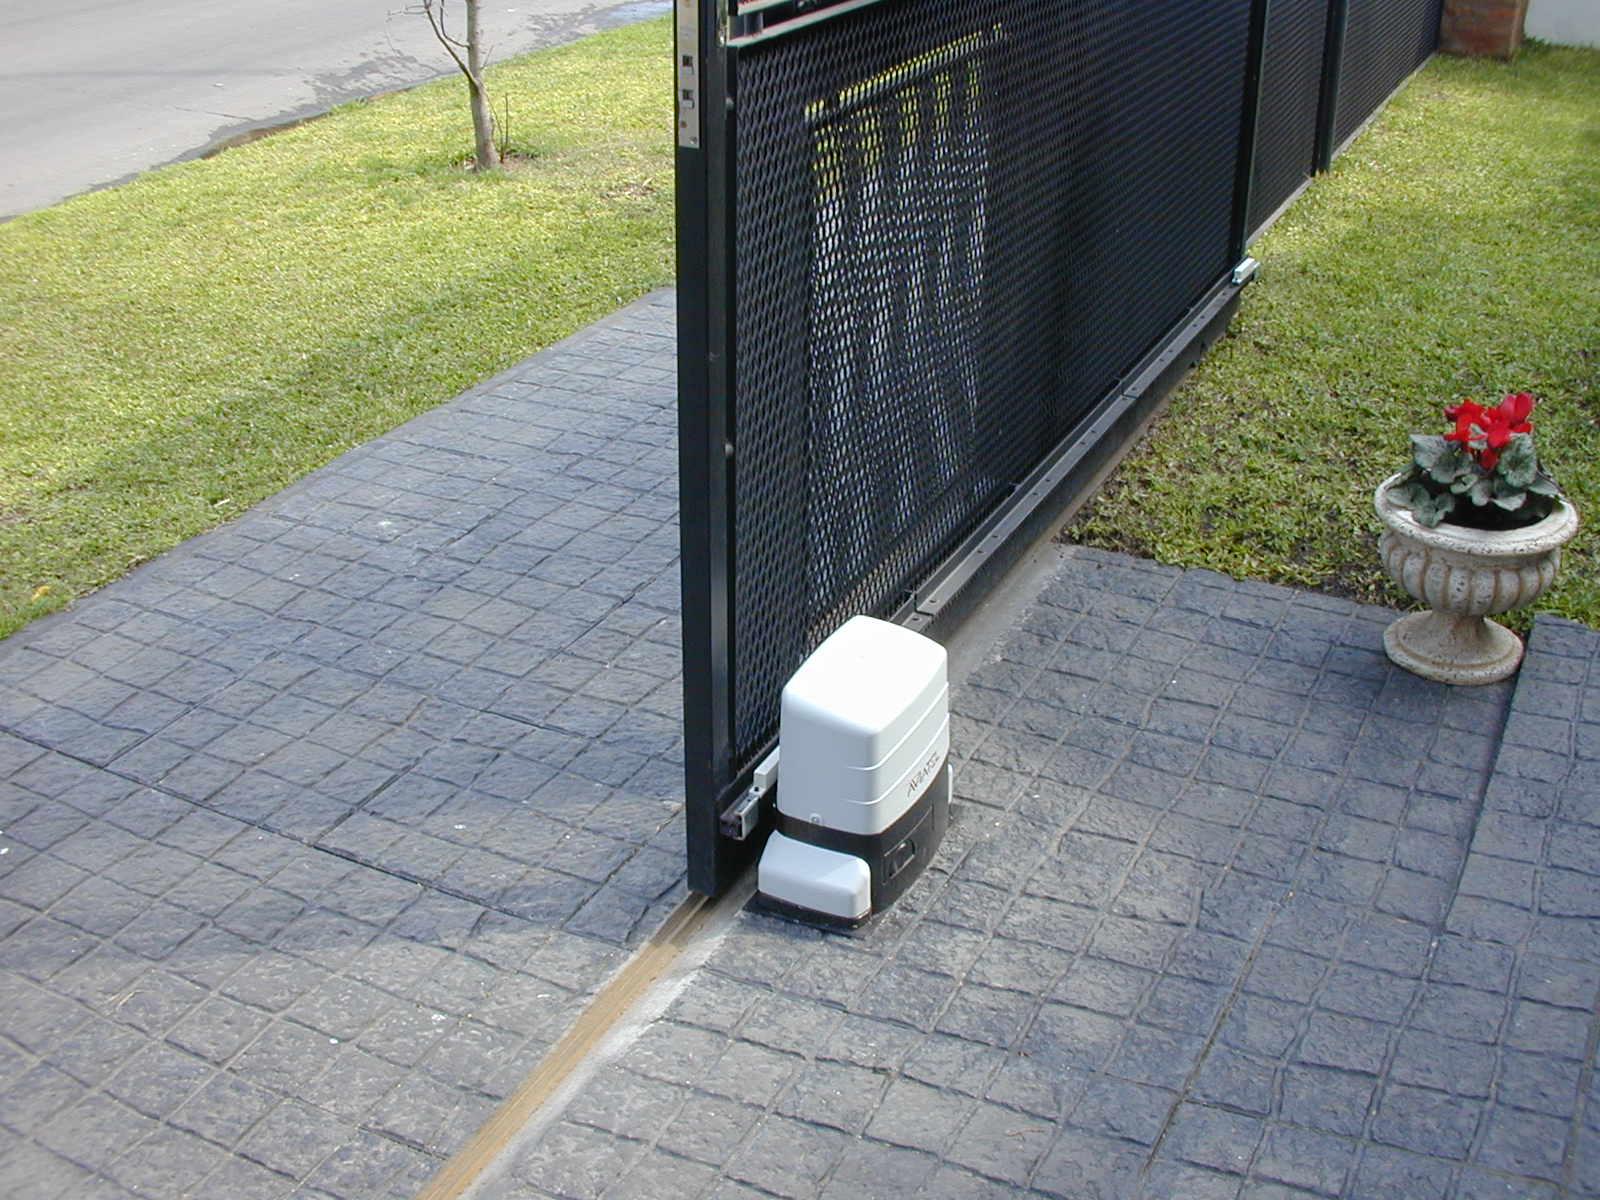 Gate opener operator